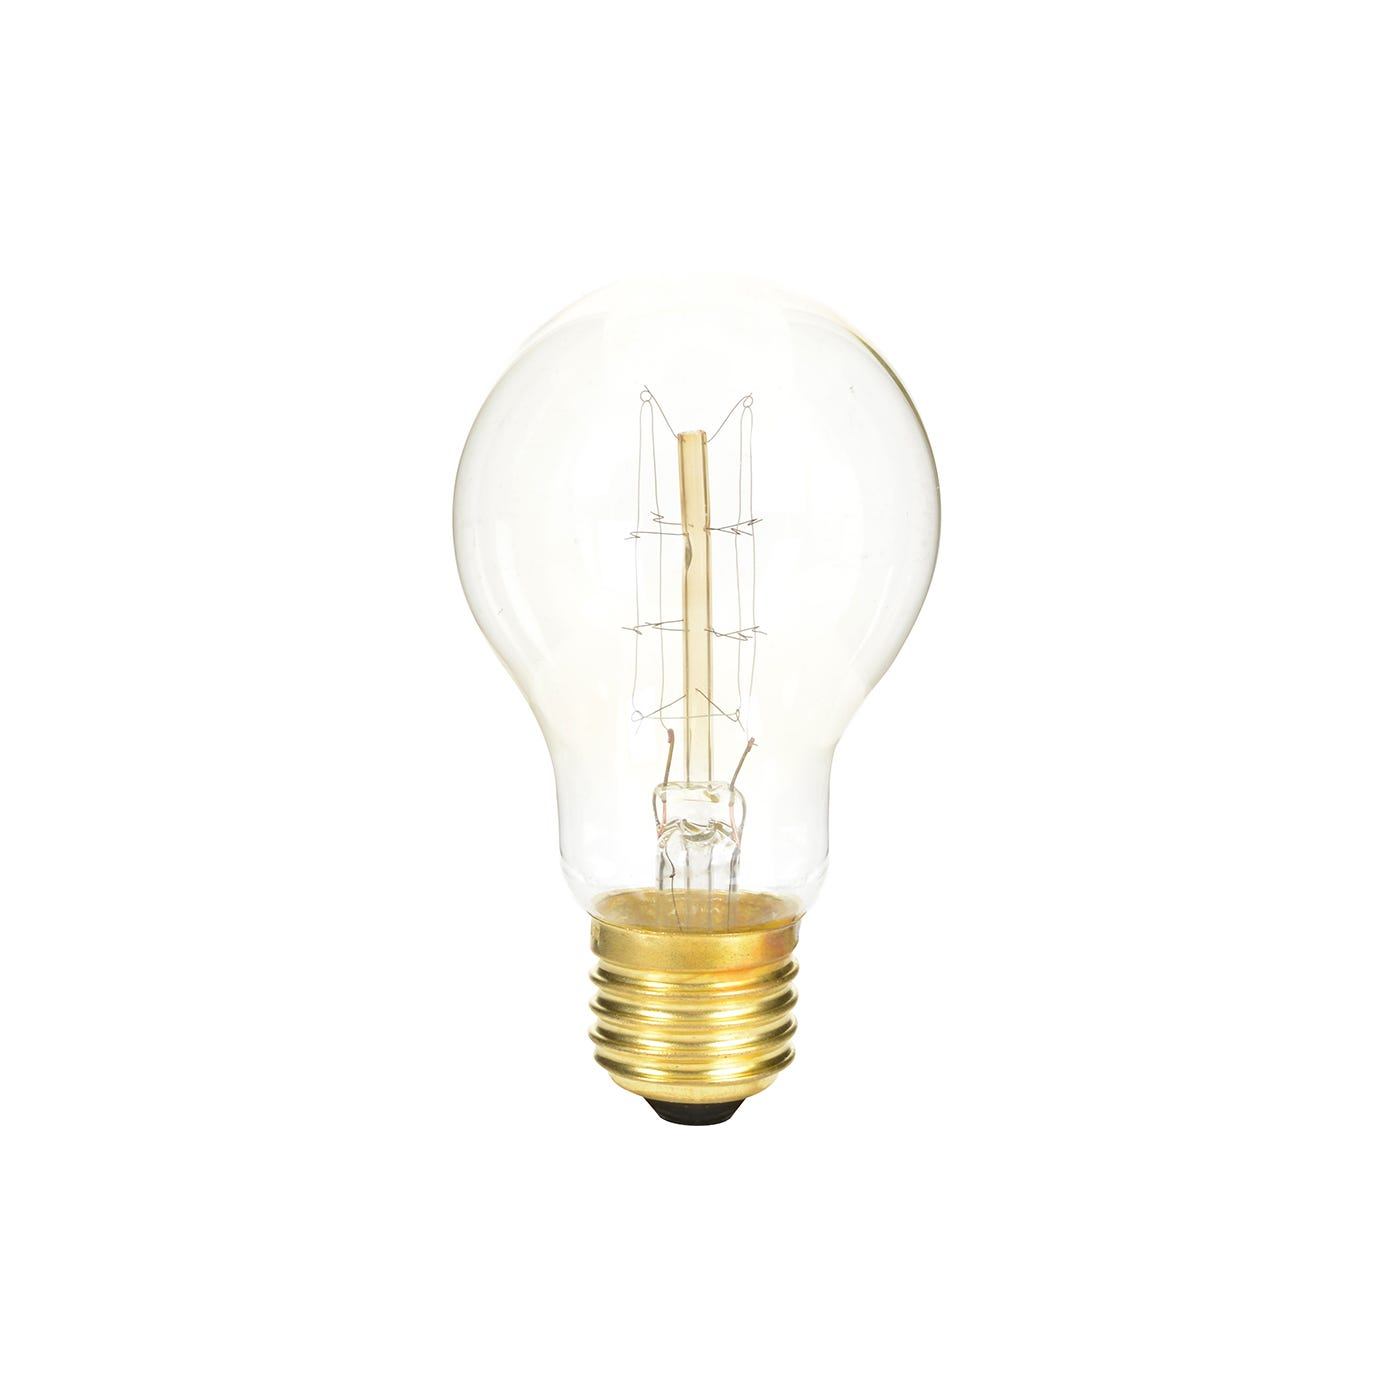 Standard Vintage E27 60W Filament Bulb